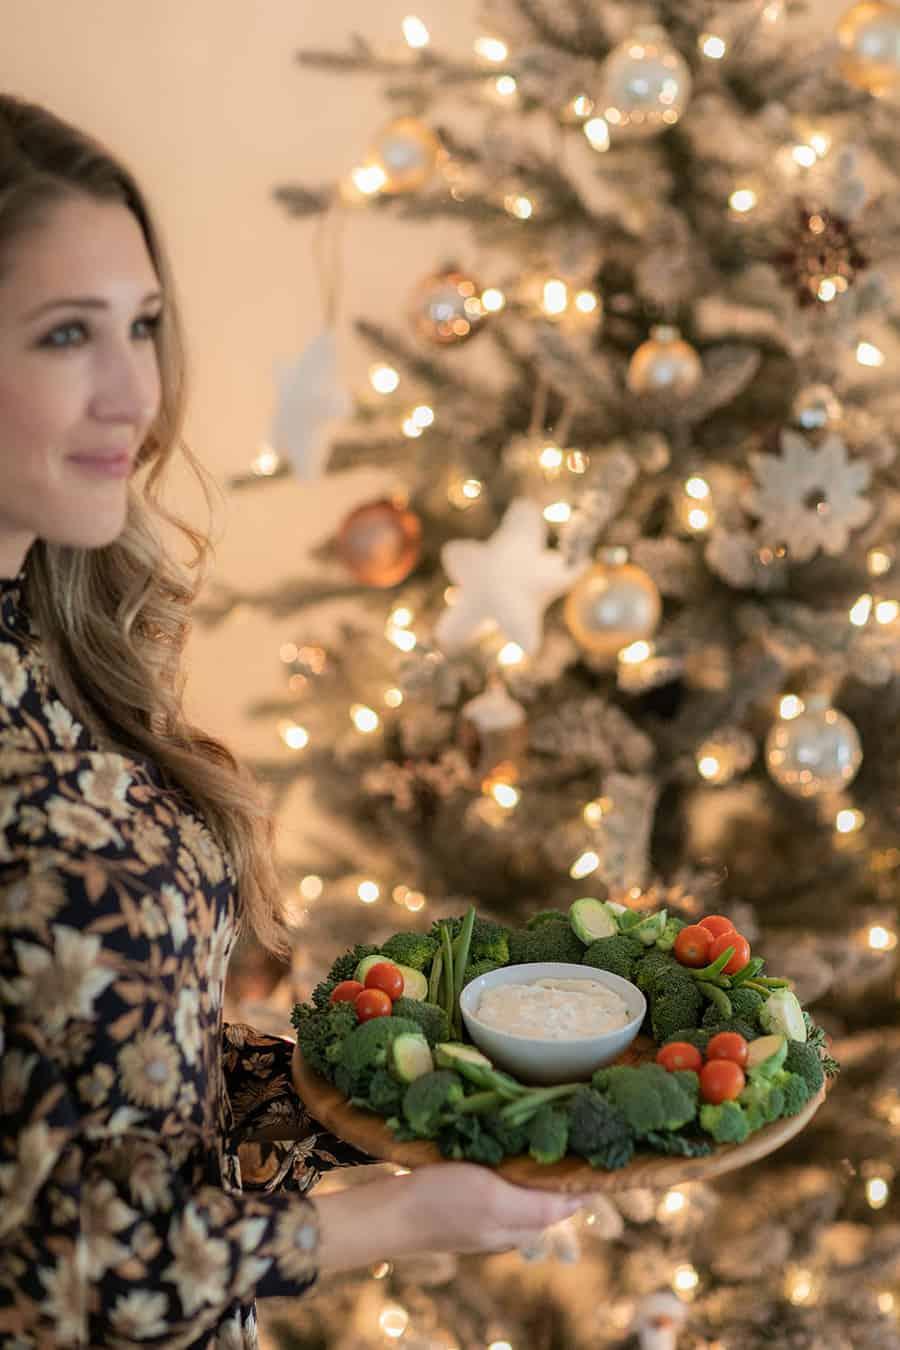 Eden Passante holding a Christmas food wreath